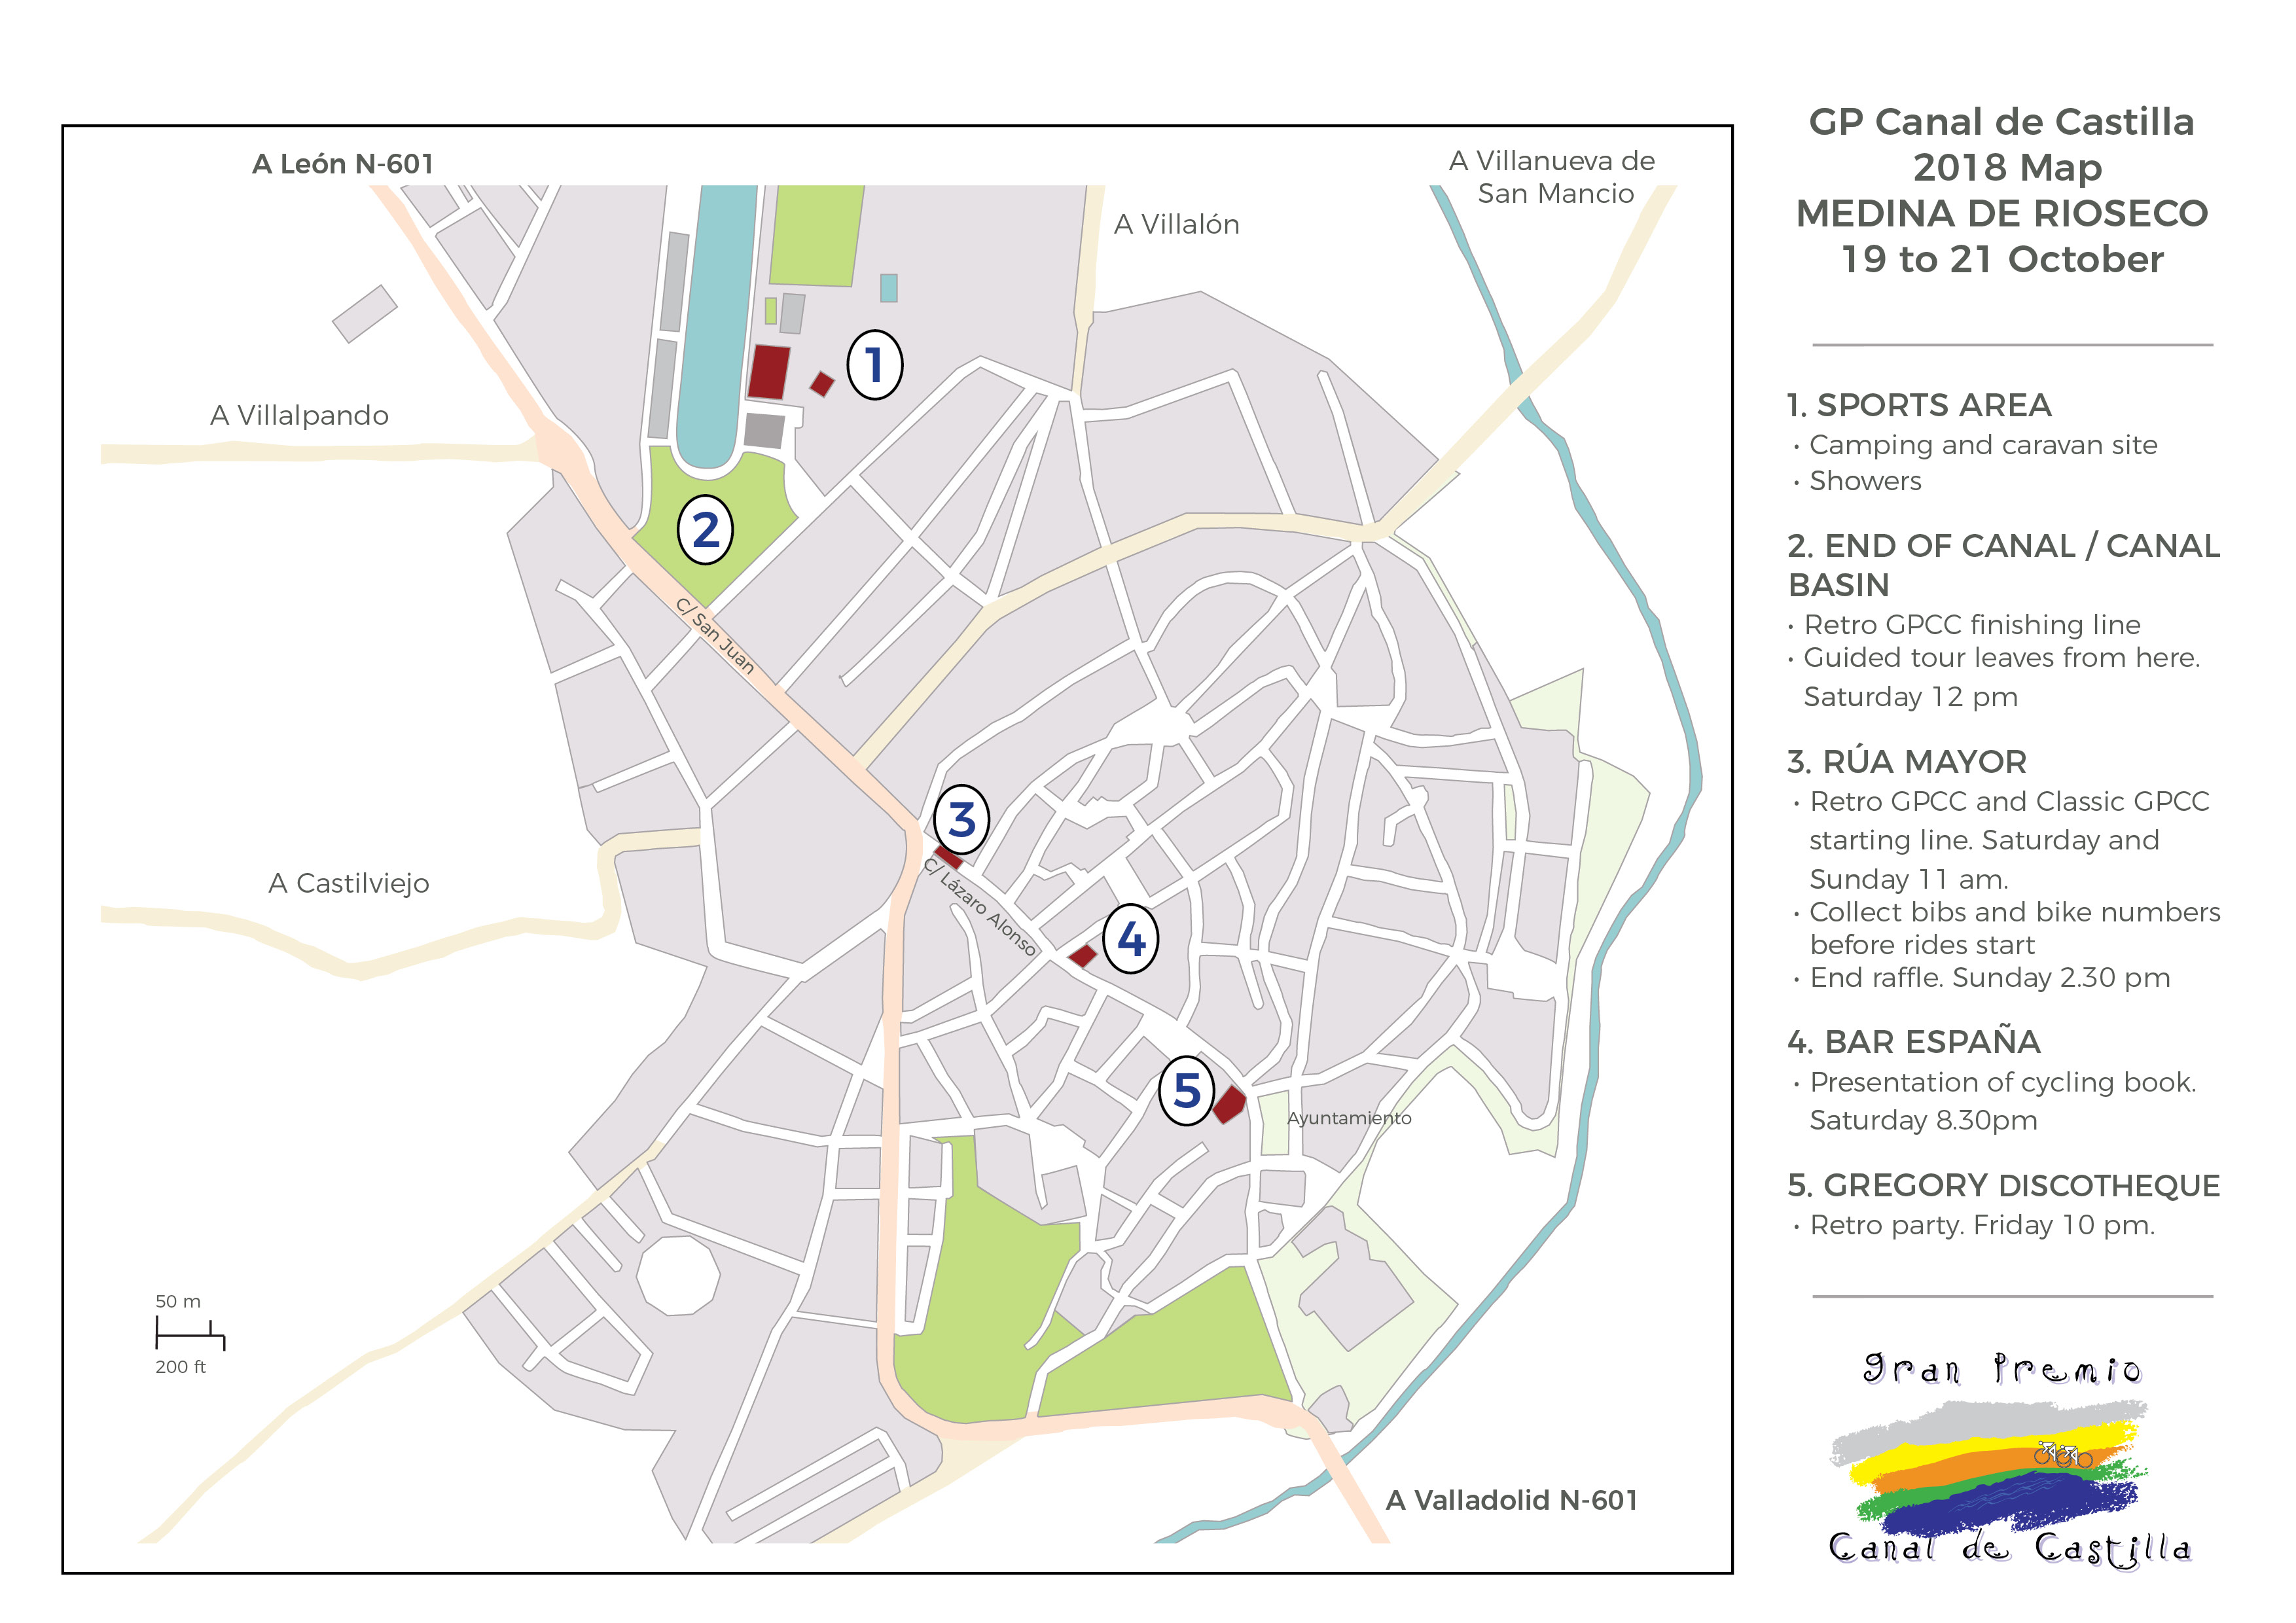 Mapa_Guia_GPCC_2018_enjpg